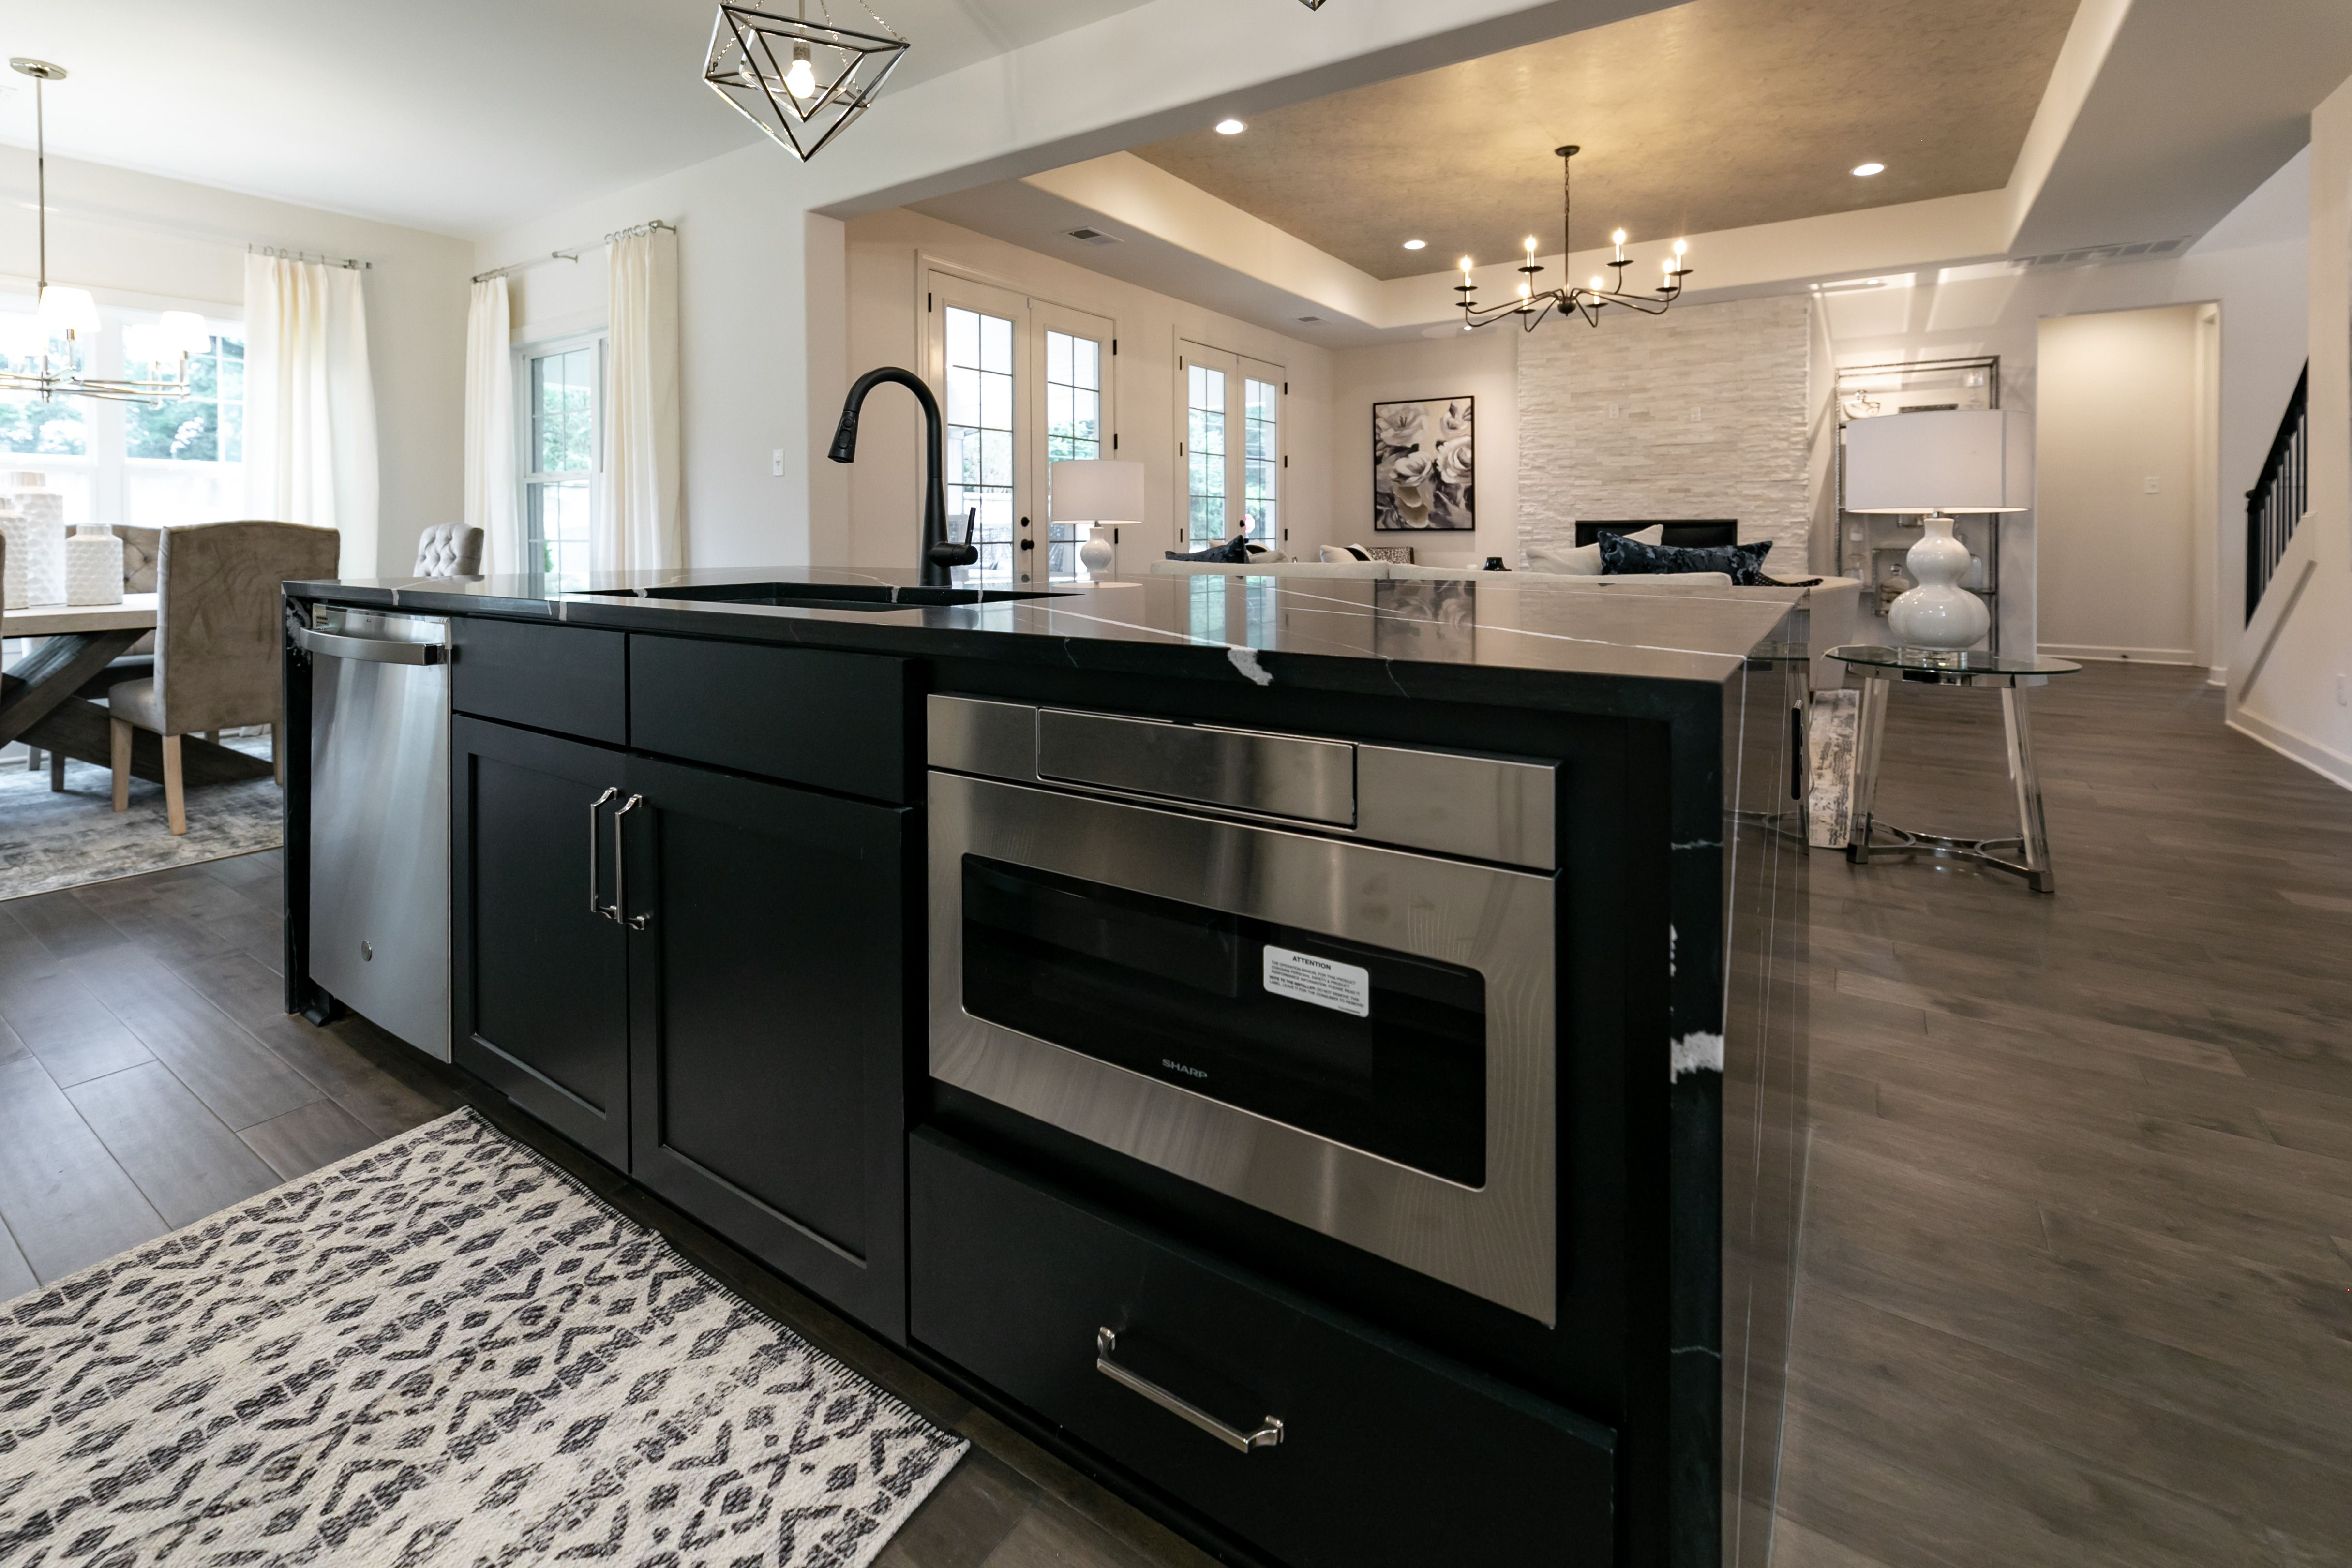 Kitchen featured in the Bailey By Regency Homebuilders in Memphis, TN